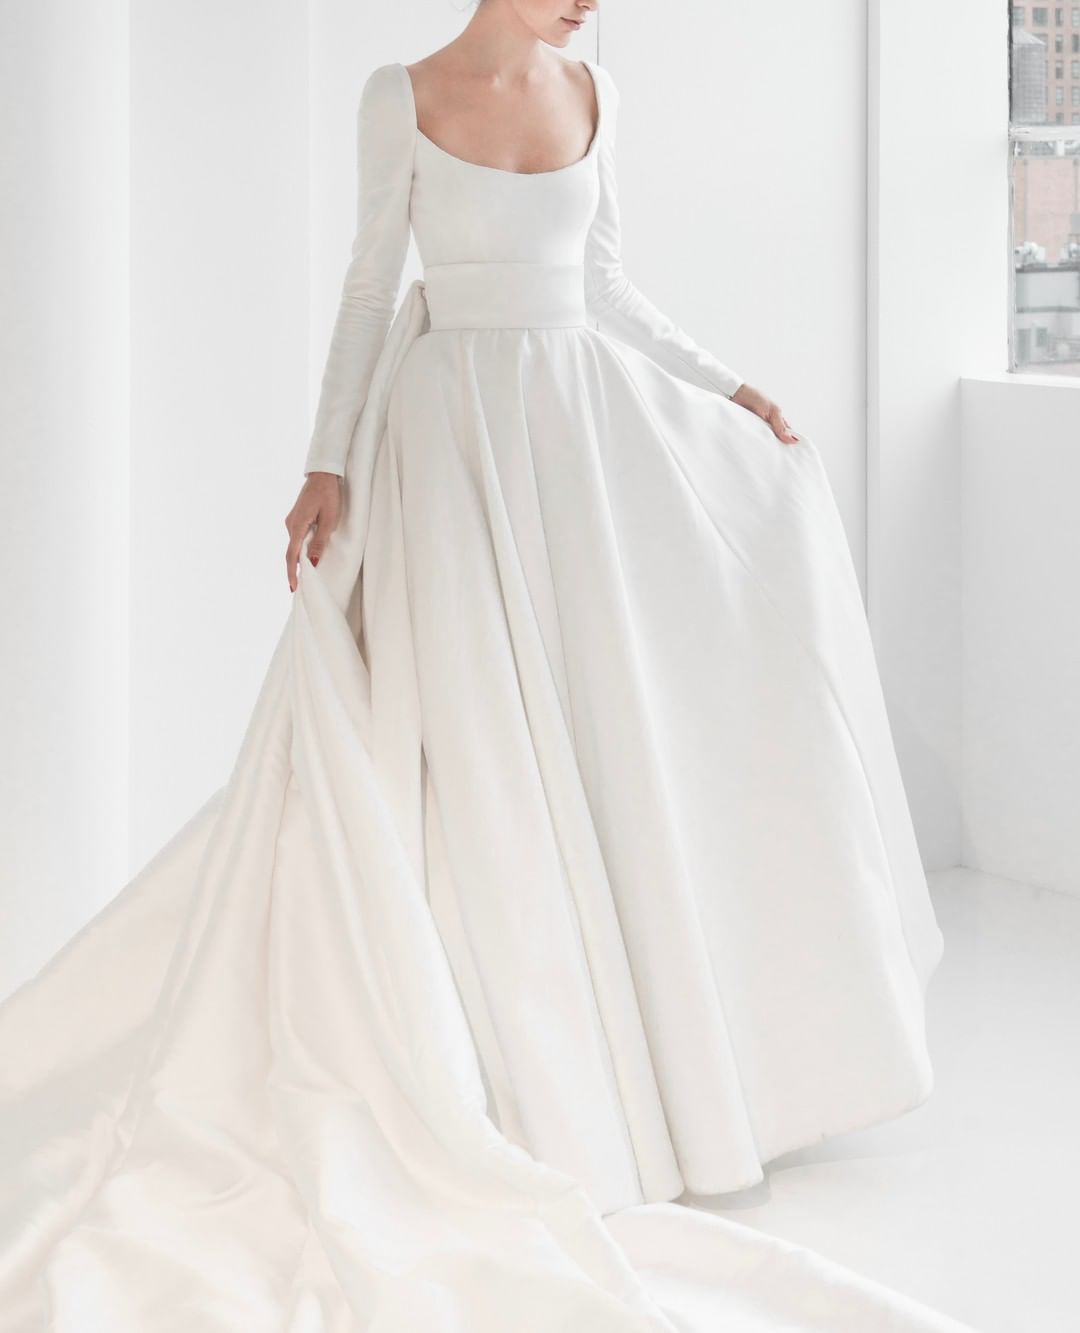 2 048 Begenme 14 Yorum Instagram Da Reem Acra Wedding Reemacrawedding In 2020 Long Sleeve Ball Gown Wedding Dress Ball Gown Wedding Dress Reem Acra Wedding Dress